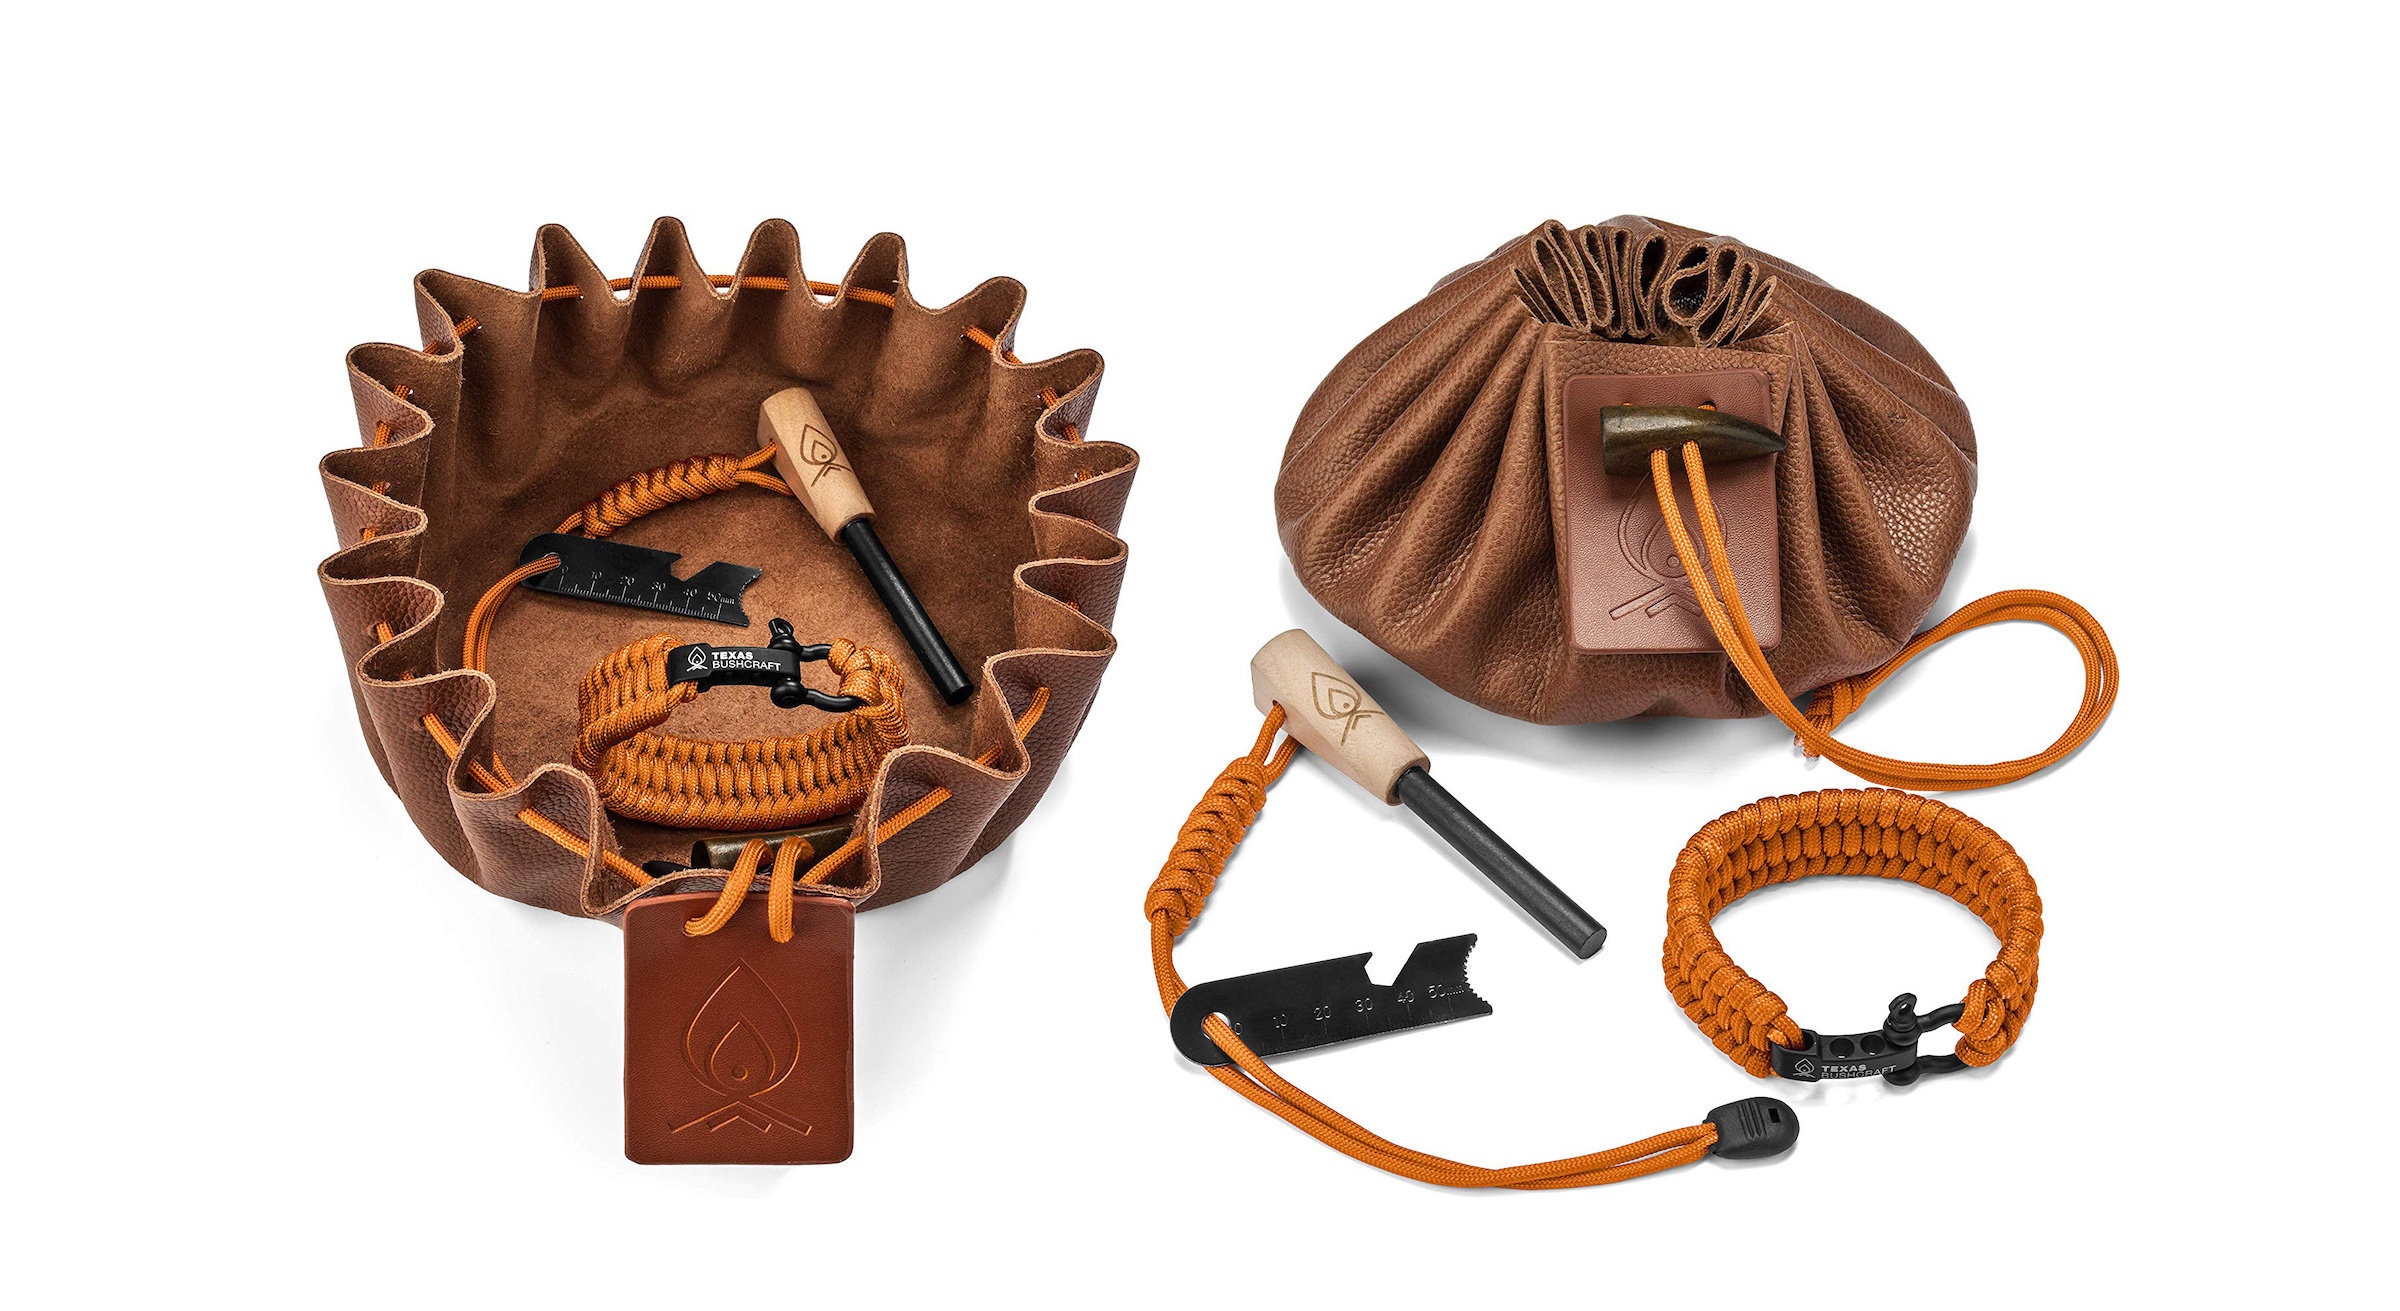 Texas Bushcraft Fire Starter Survival Kit